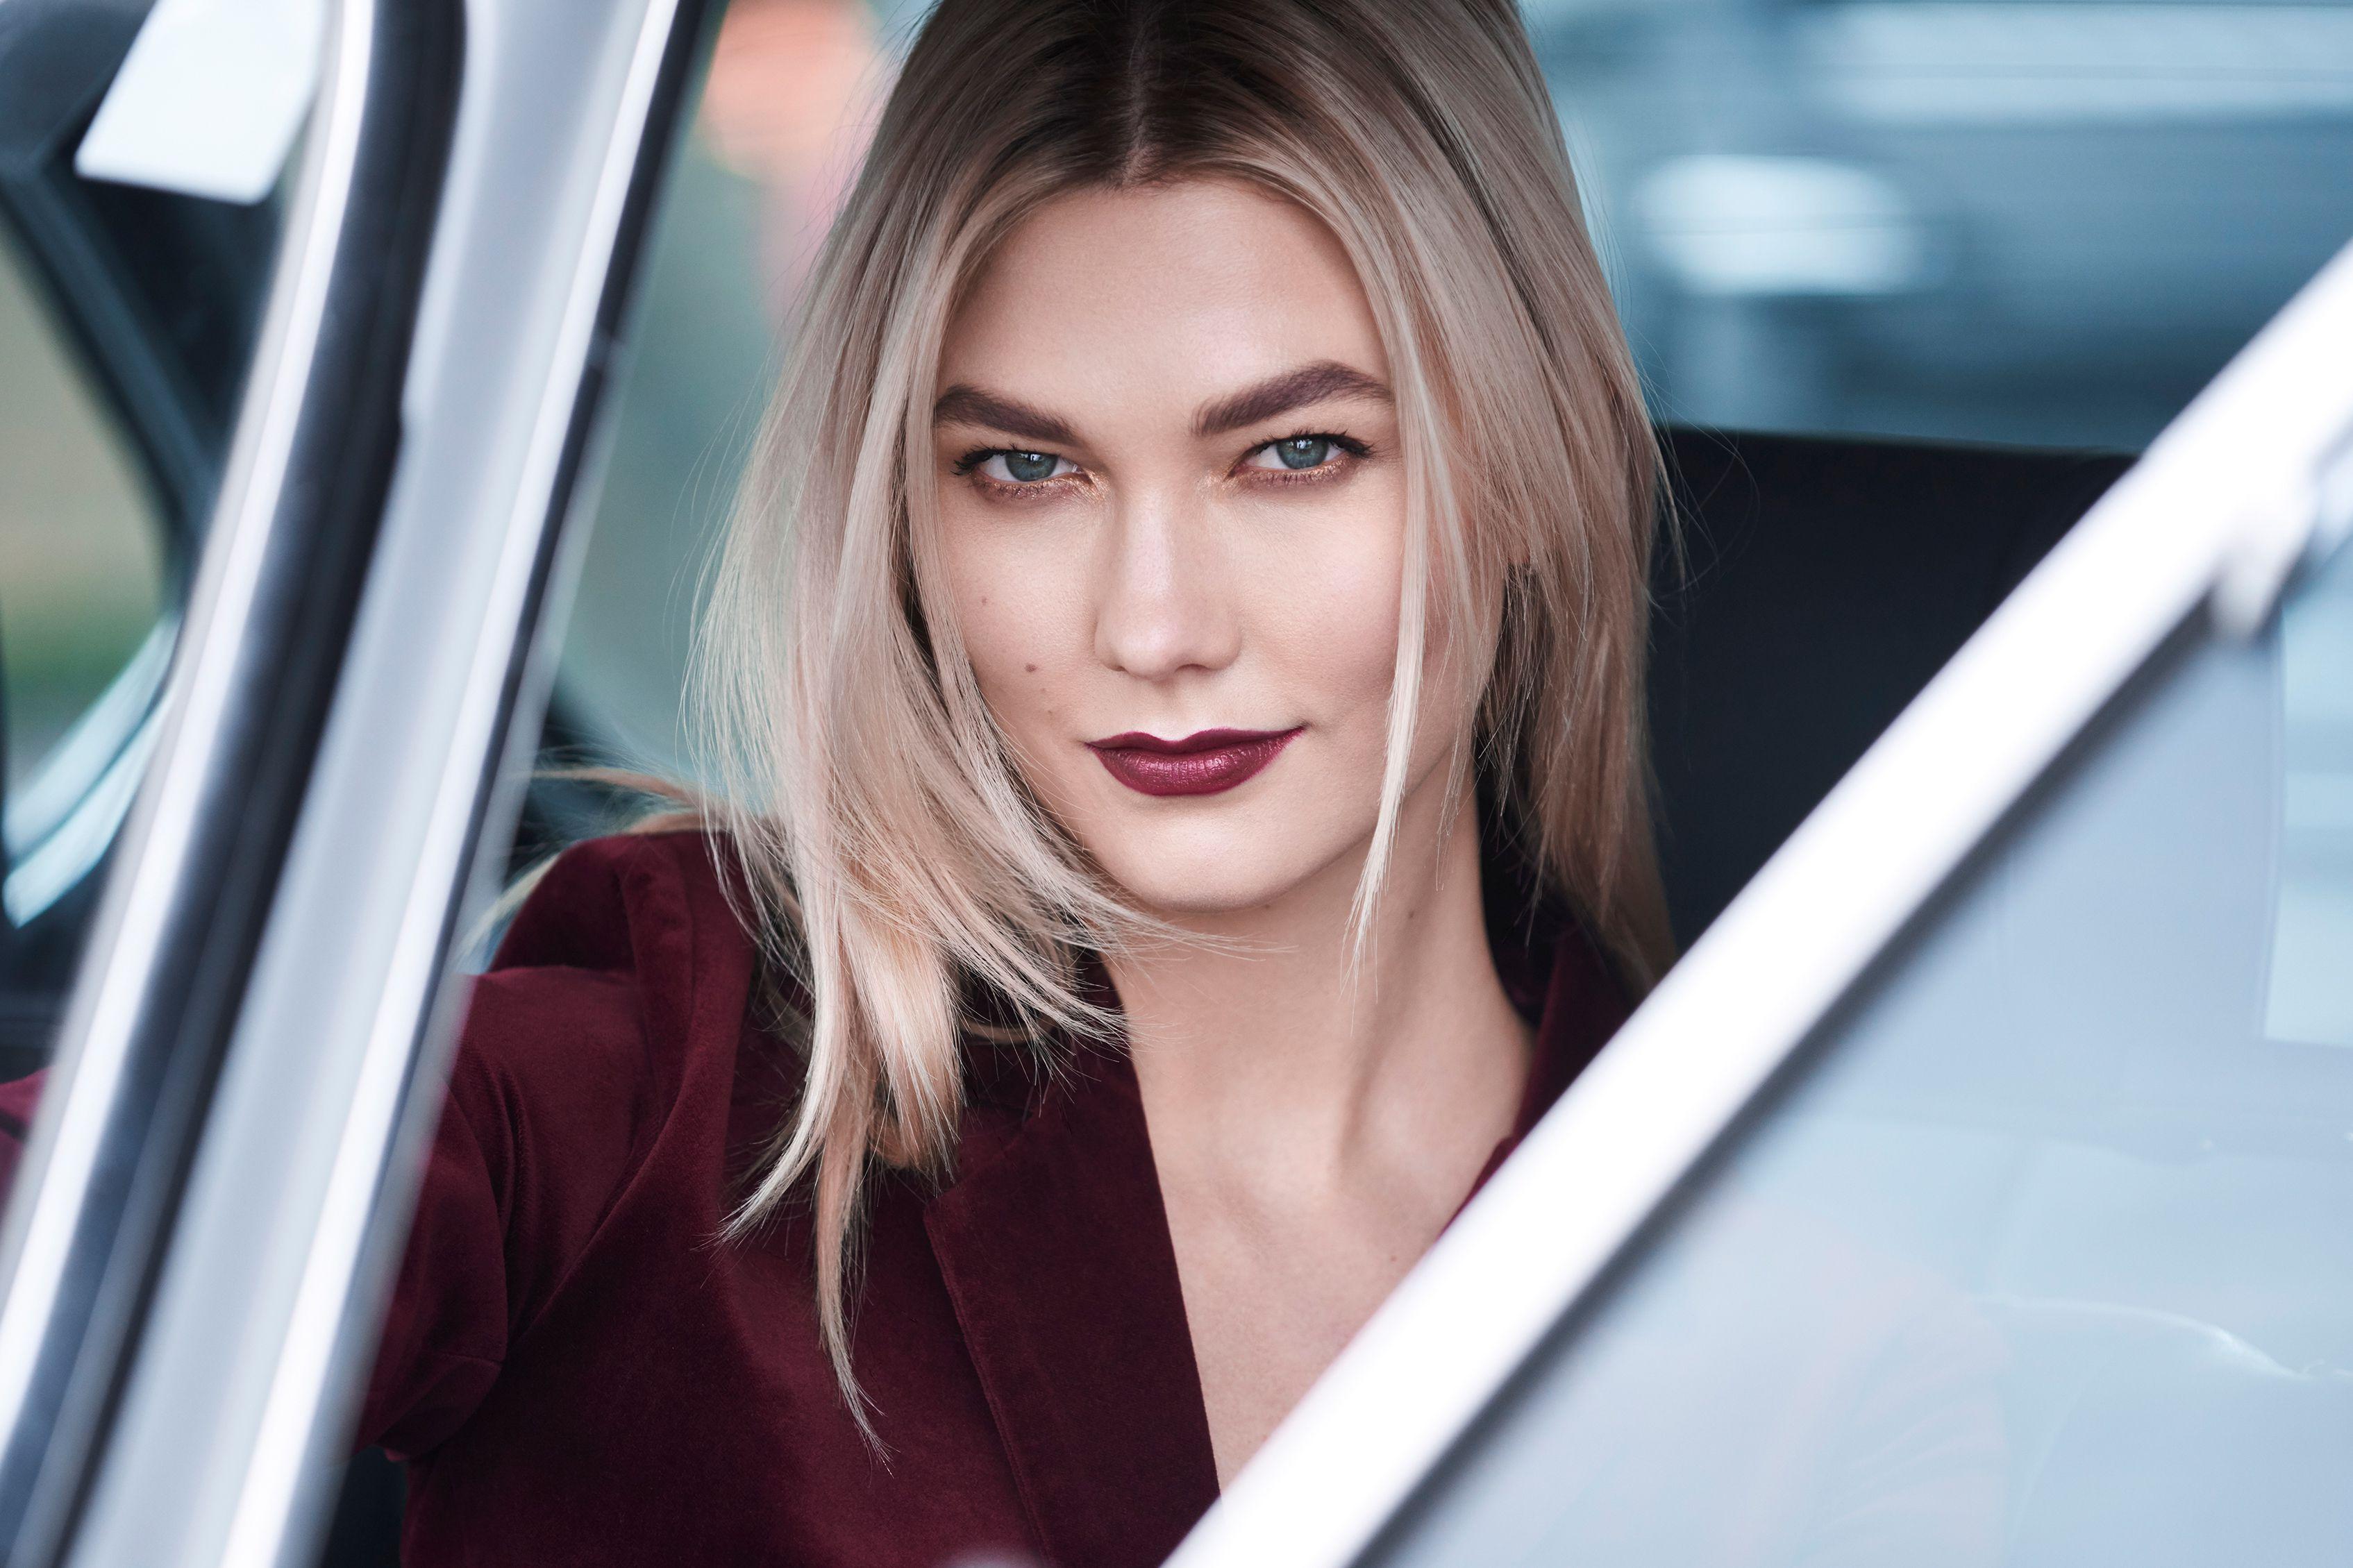 karlie kloss makeup celebrity wallpaper 64427